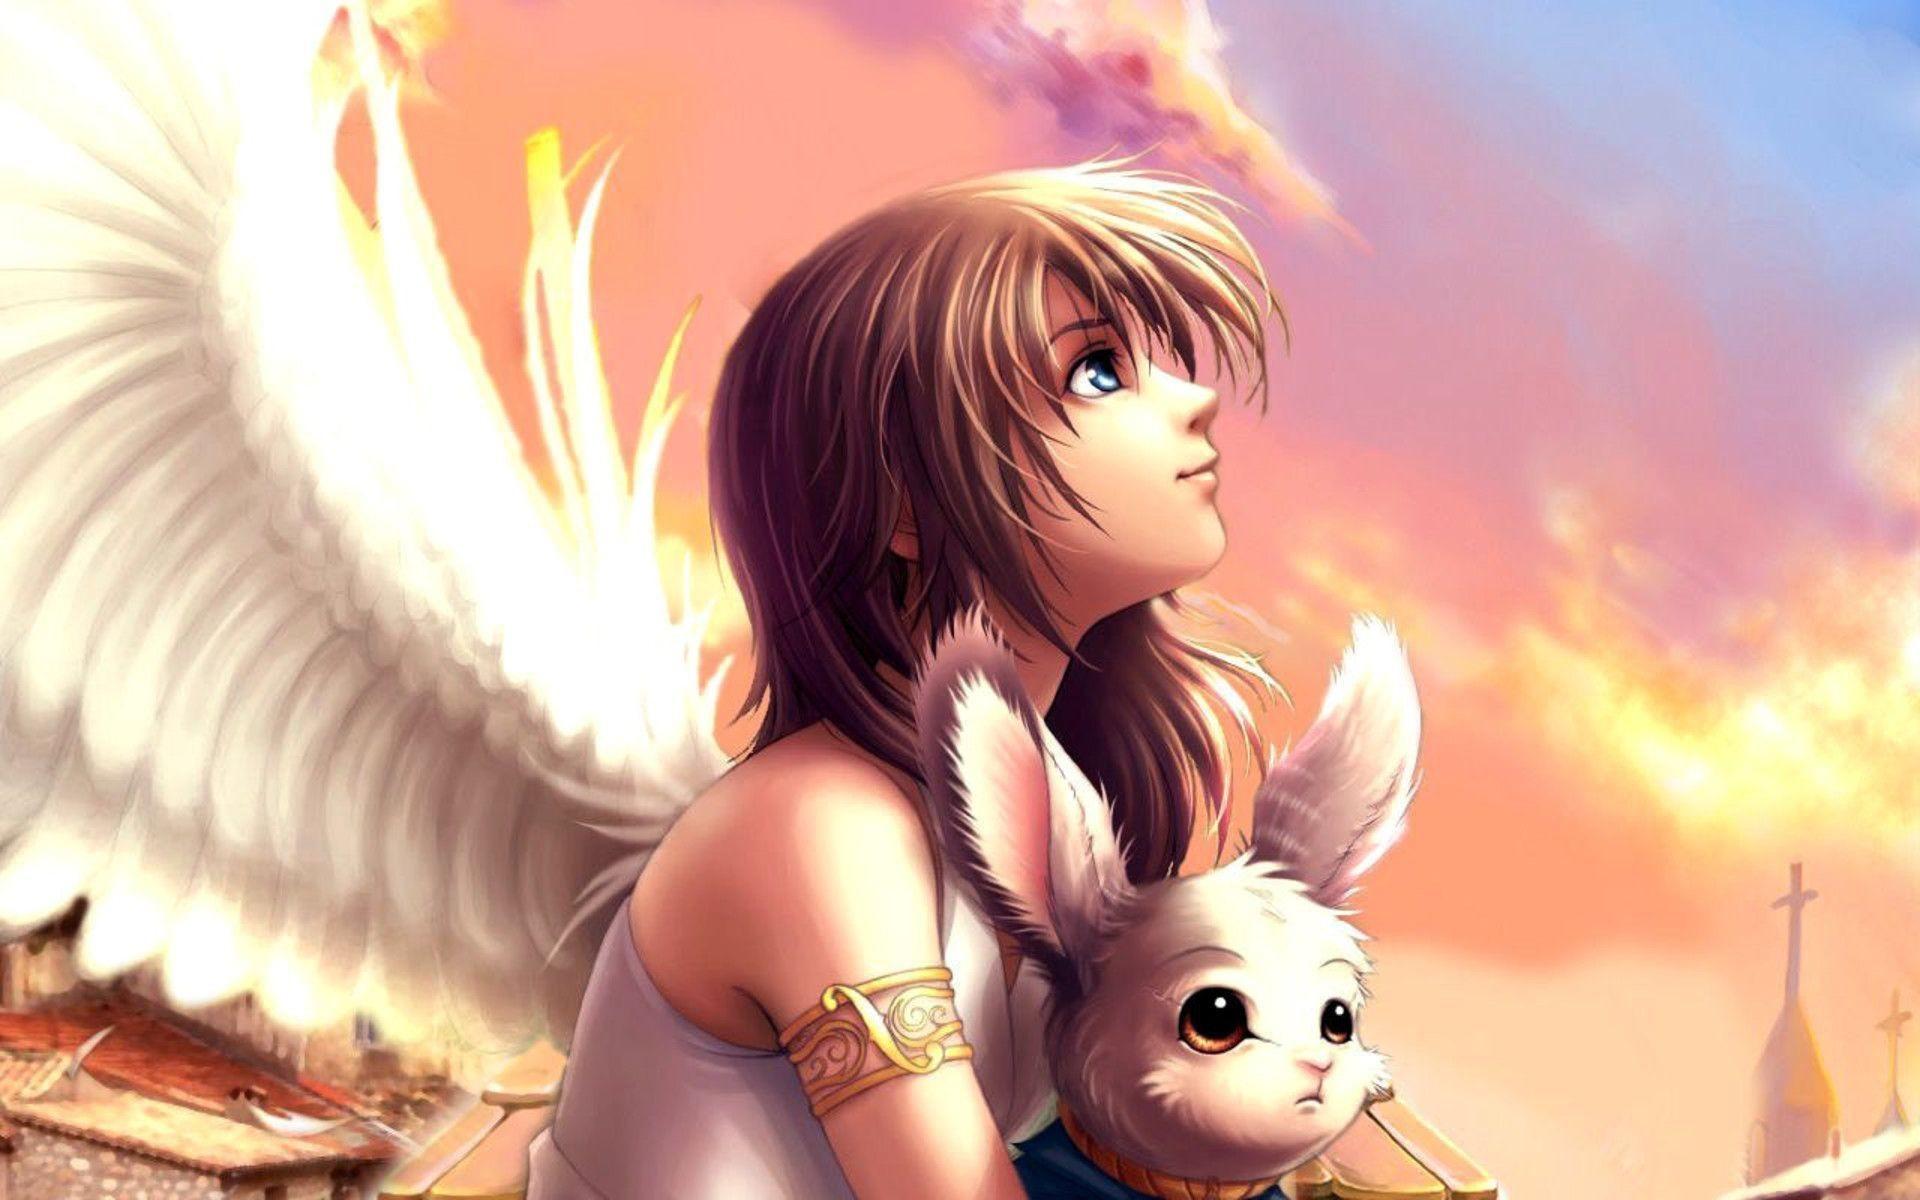 Samsung Galaxy S6 Wallpaper Anime Demon Girls Anime Angel Wallpaper 66 Images